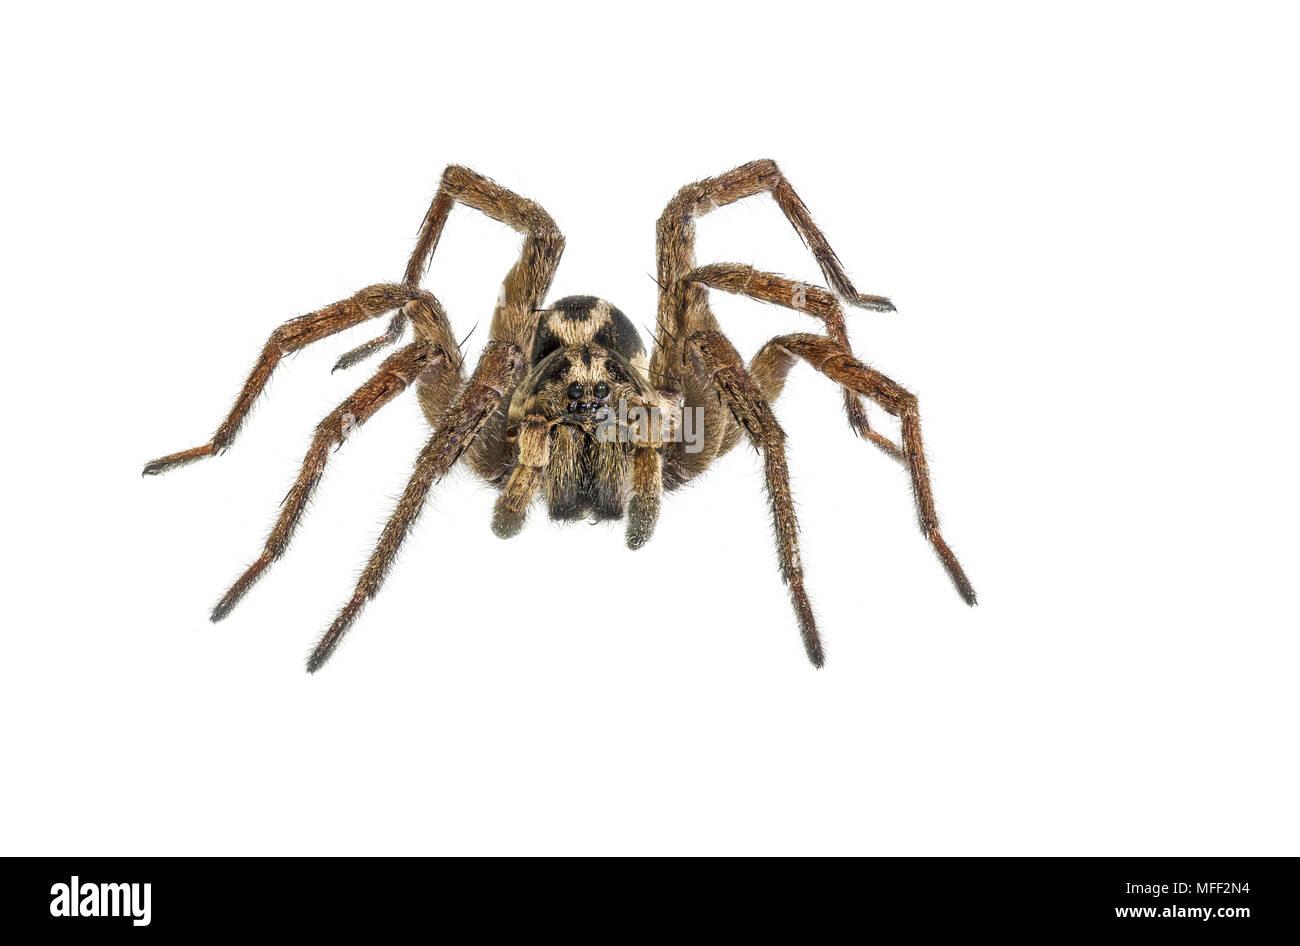 Wolfspider (Venatrix spp.?), Fam. Lycosidae, Image focus-stacked, Armidale, New South Wales, Australia - Stock Image